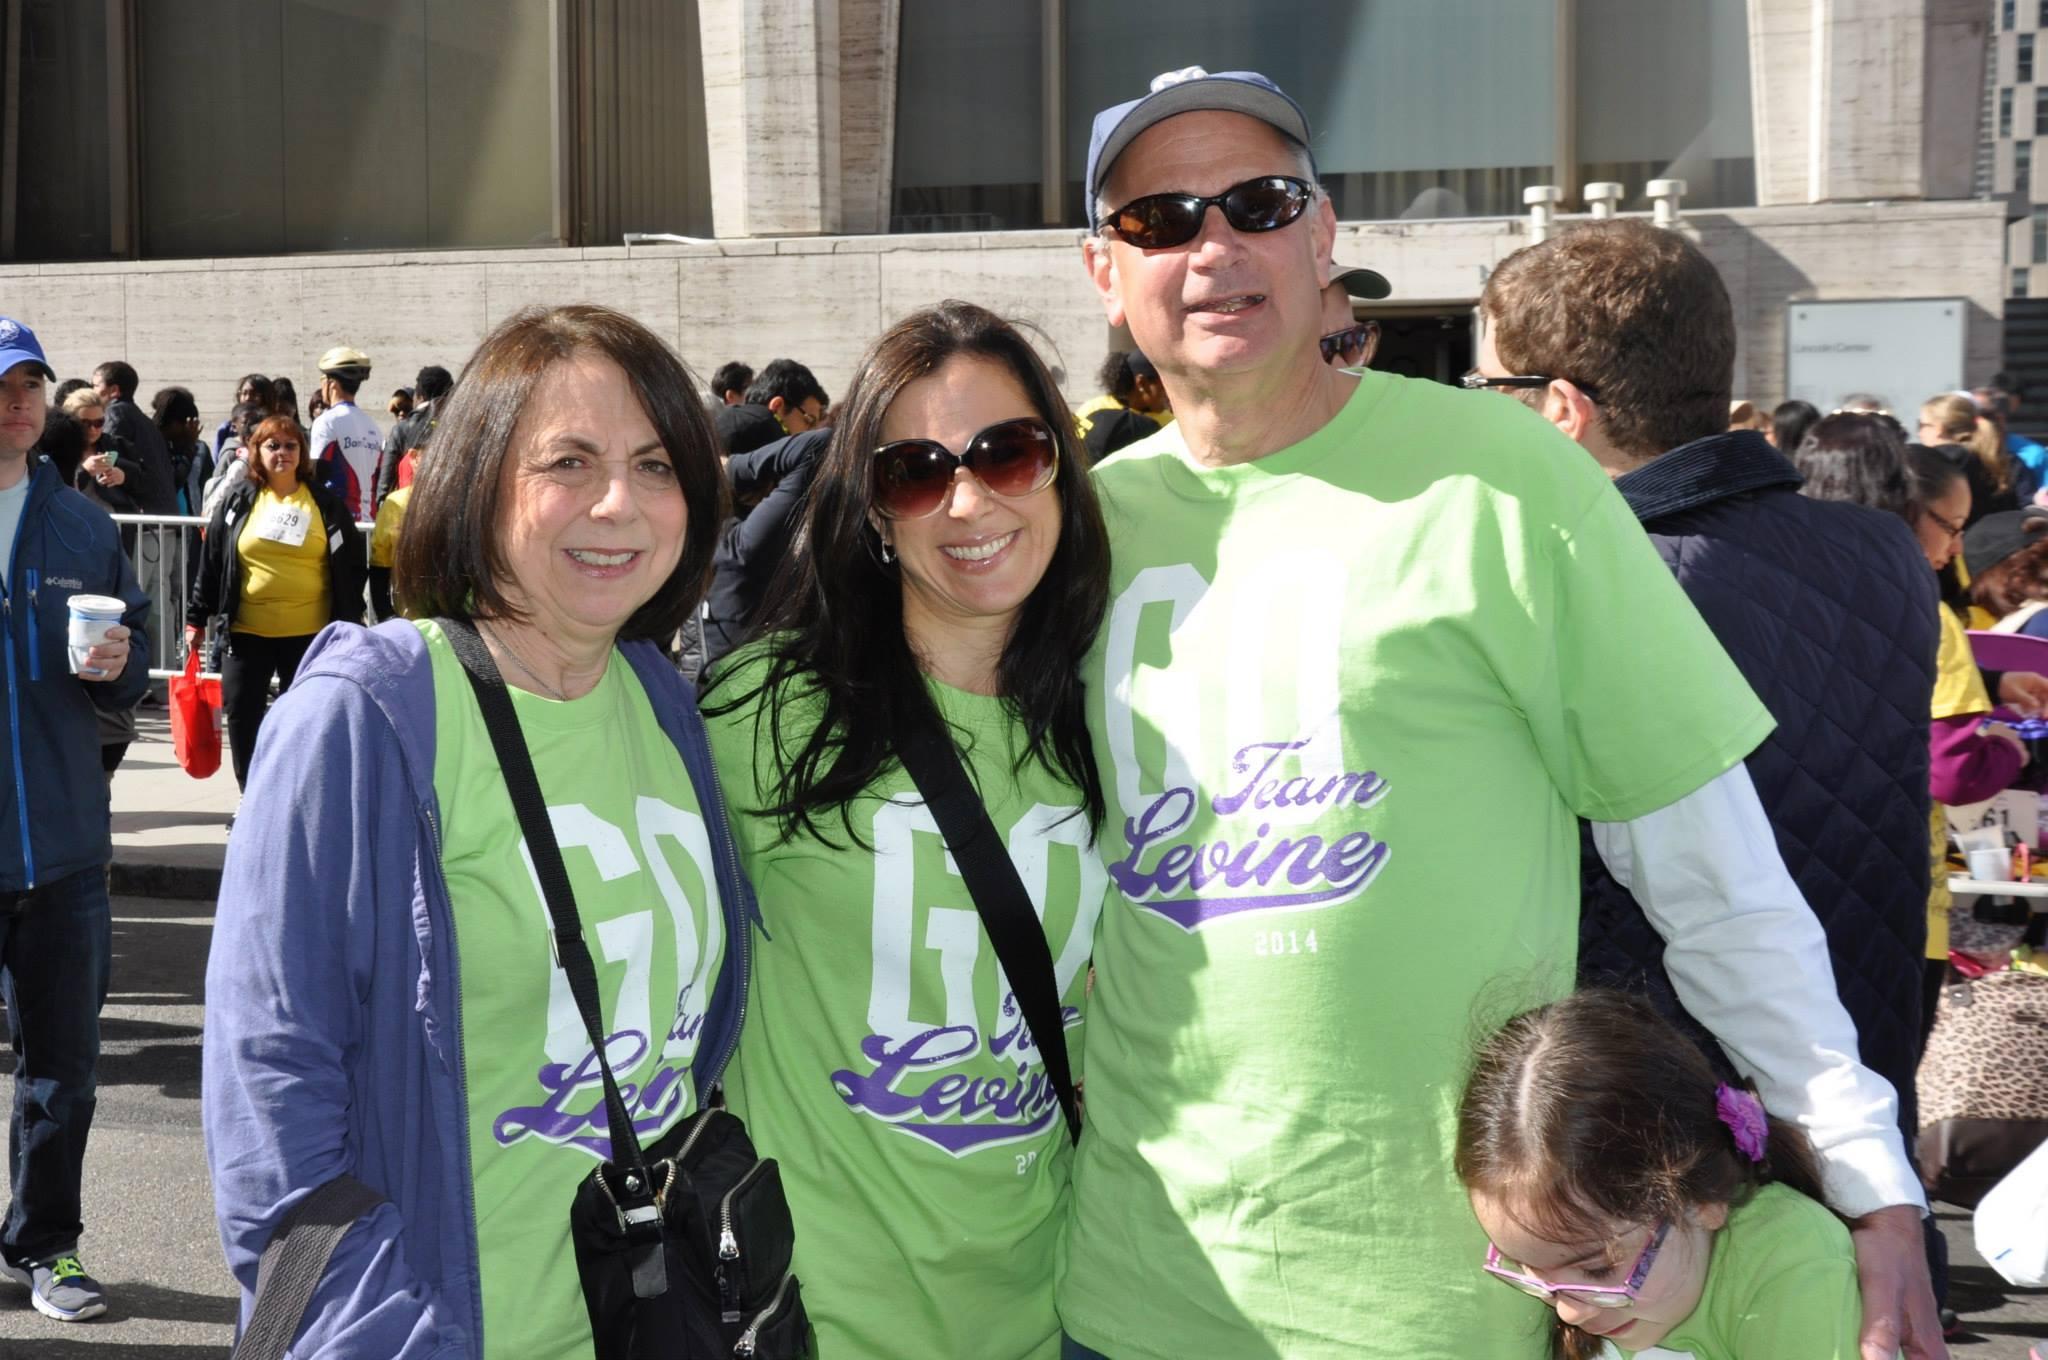 donna-berowitz-paulina-levine-stephen-berowitz-olivia-levine-at-the-2015-march-for-babies-walk_16297451503_o.jpg